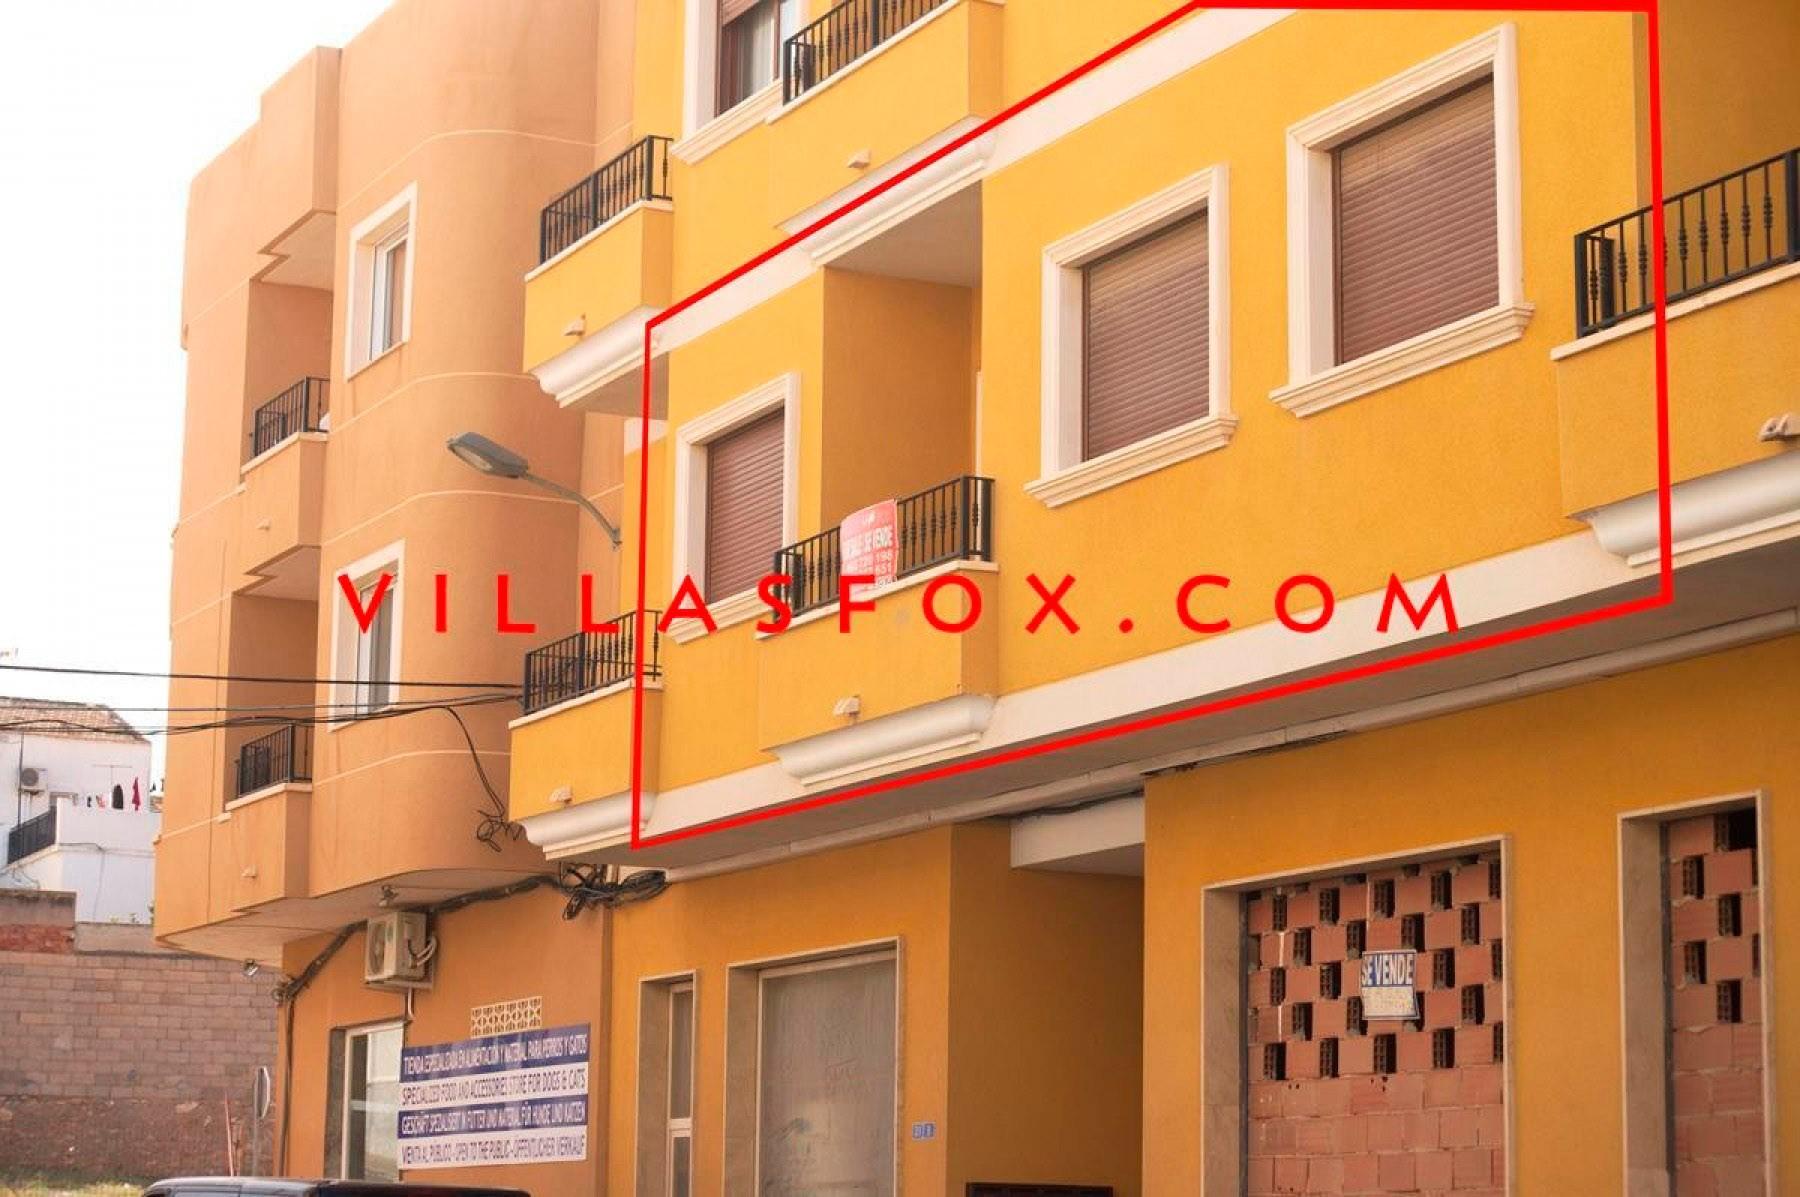 2-bedroom spacious 1st-floor apartment, San Miguel de Salinas with optional garage space